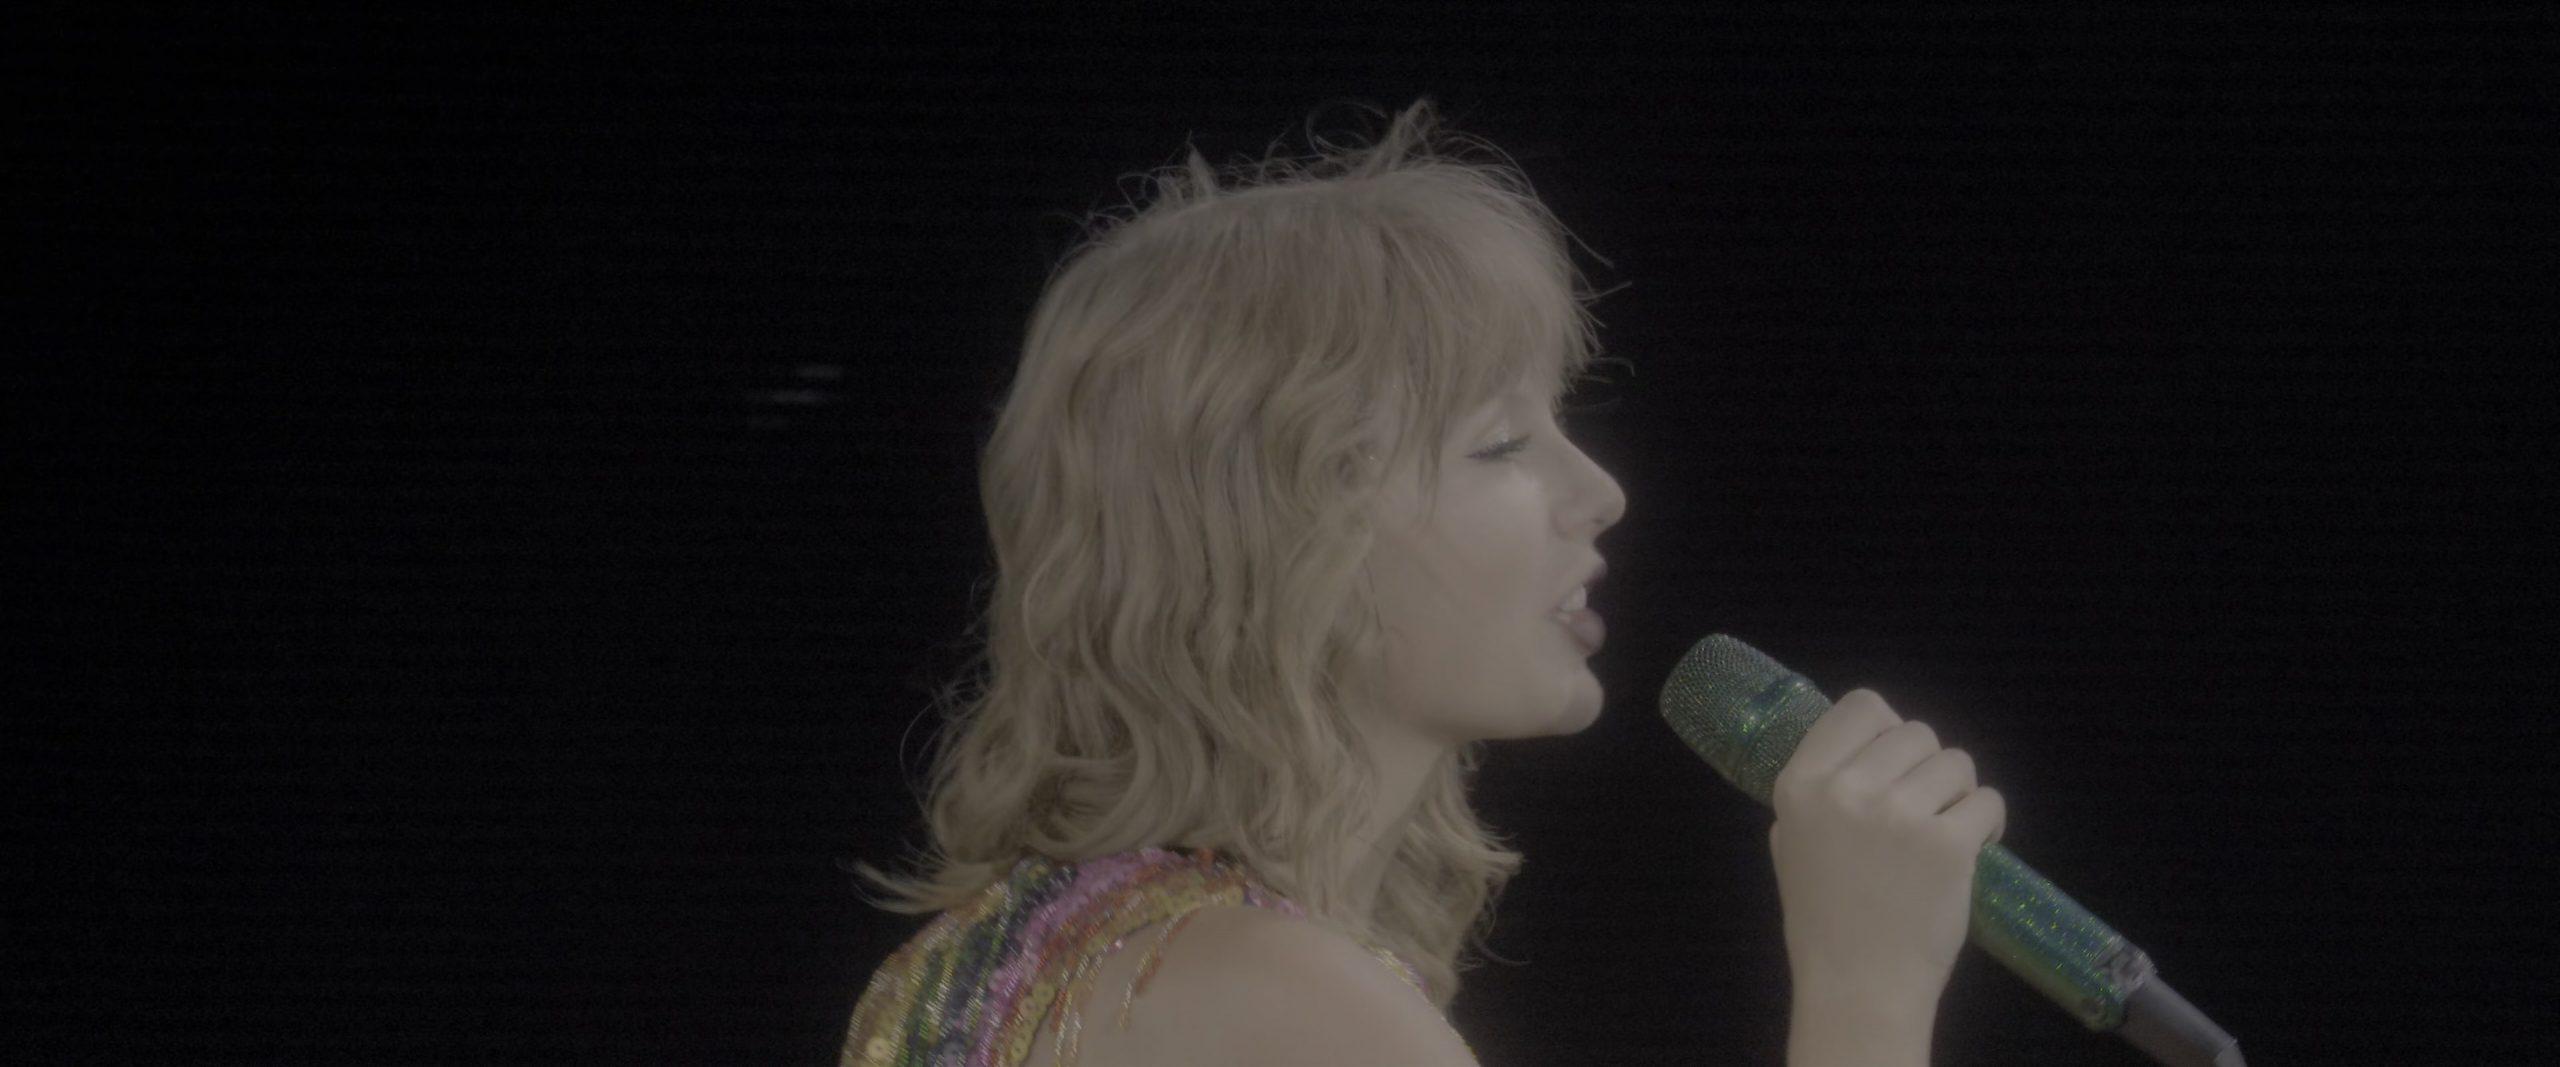 Taylor Swift - Reputation Stadium Tour (2018) 2160p HDR Netflix WEBRip DD+ Atmos 5.1 x265-TrollUHD.mkv_20200301_141141.166